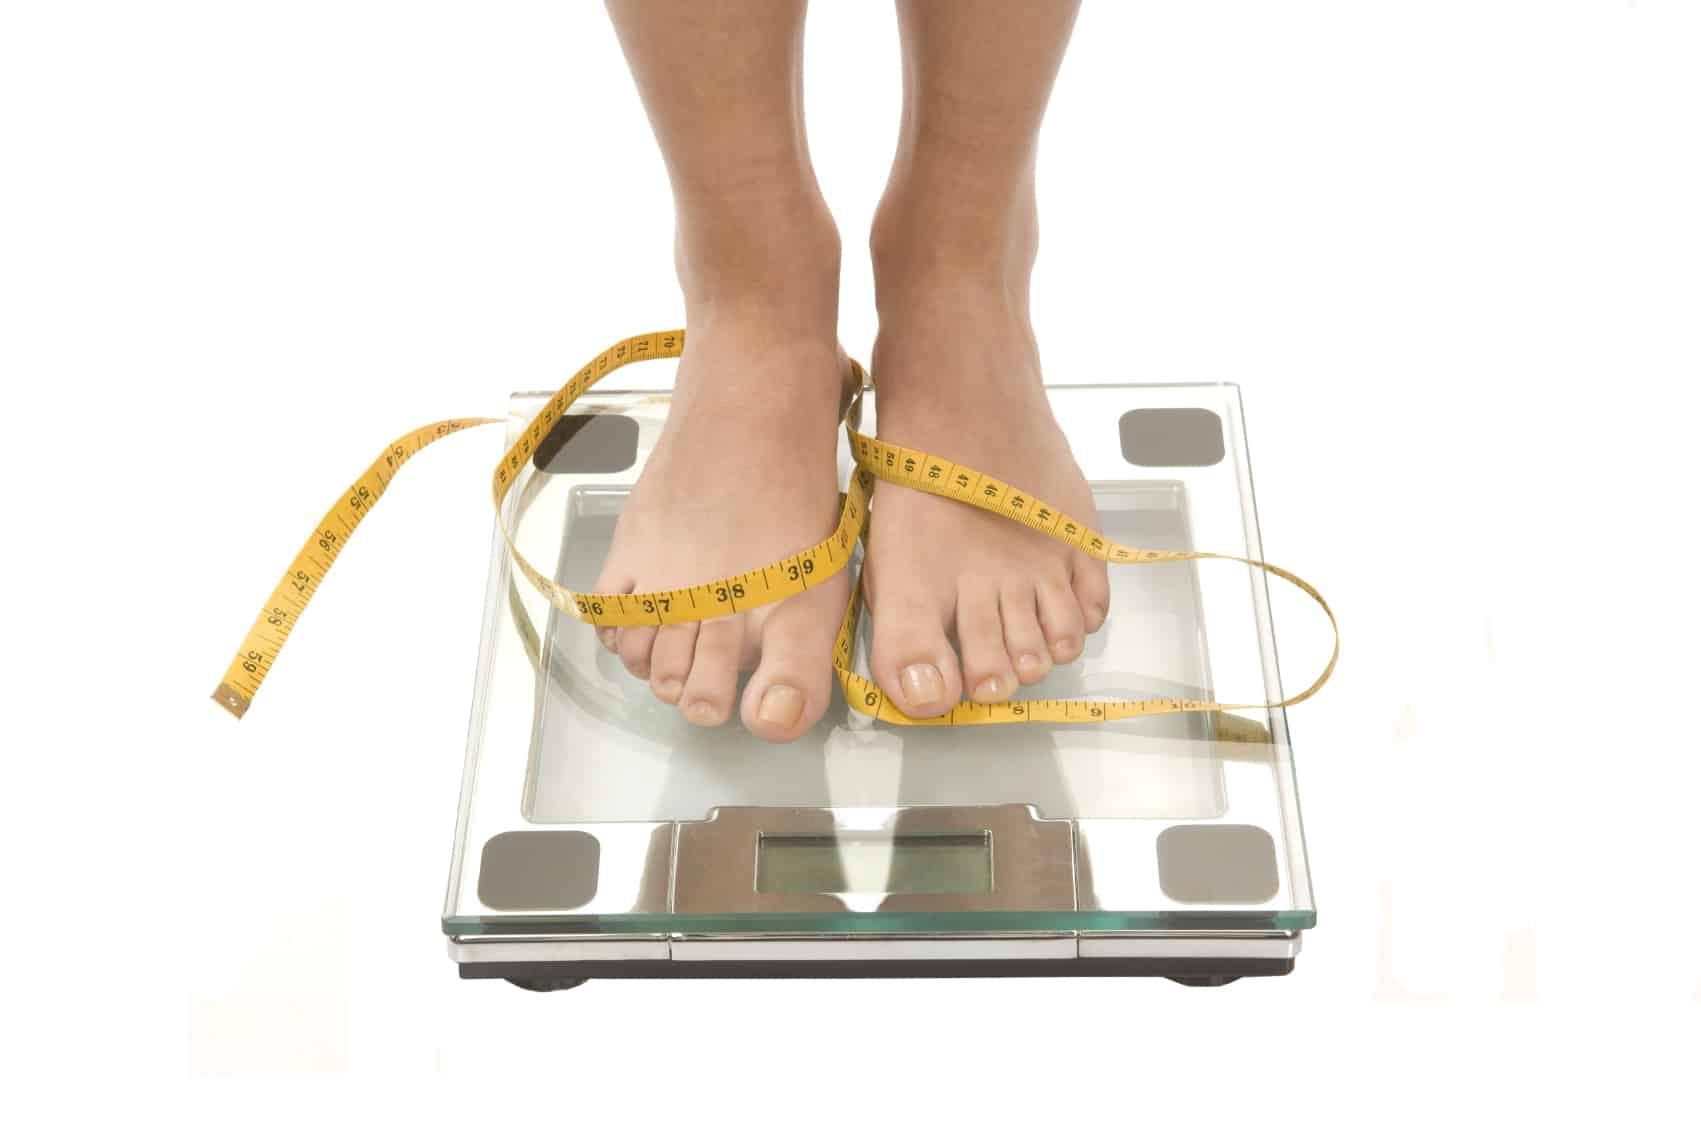 0f19a563b فوائد الخميرة لزيادة الوزن - موسوعة